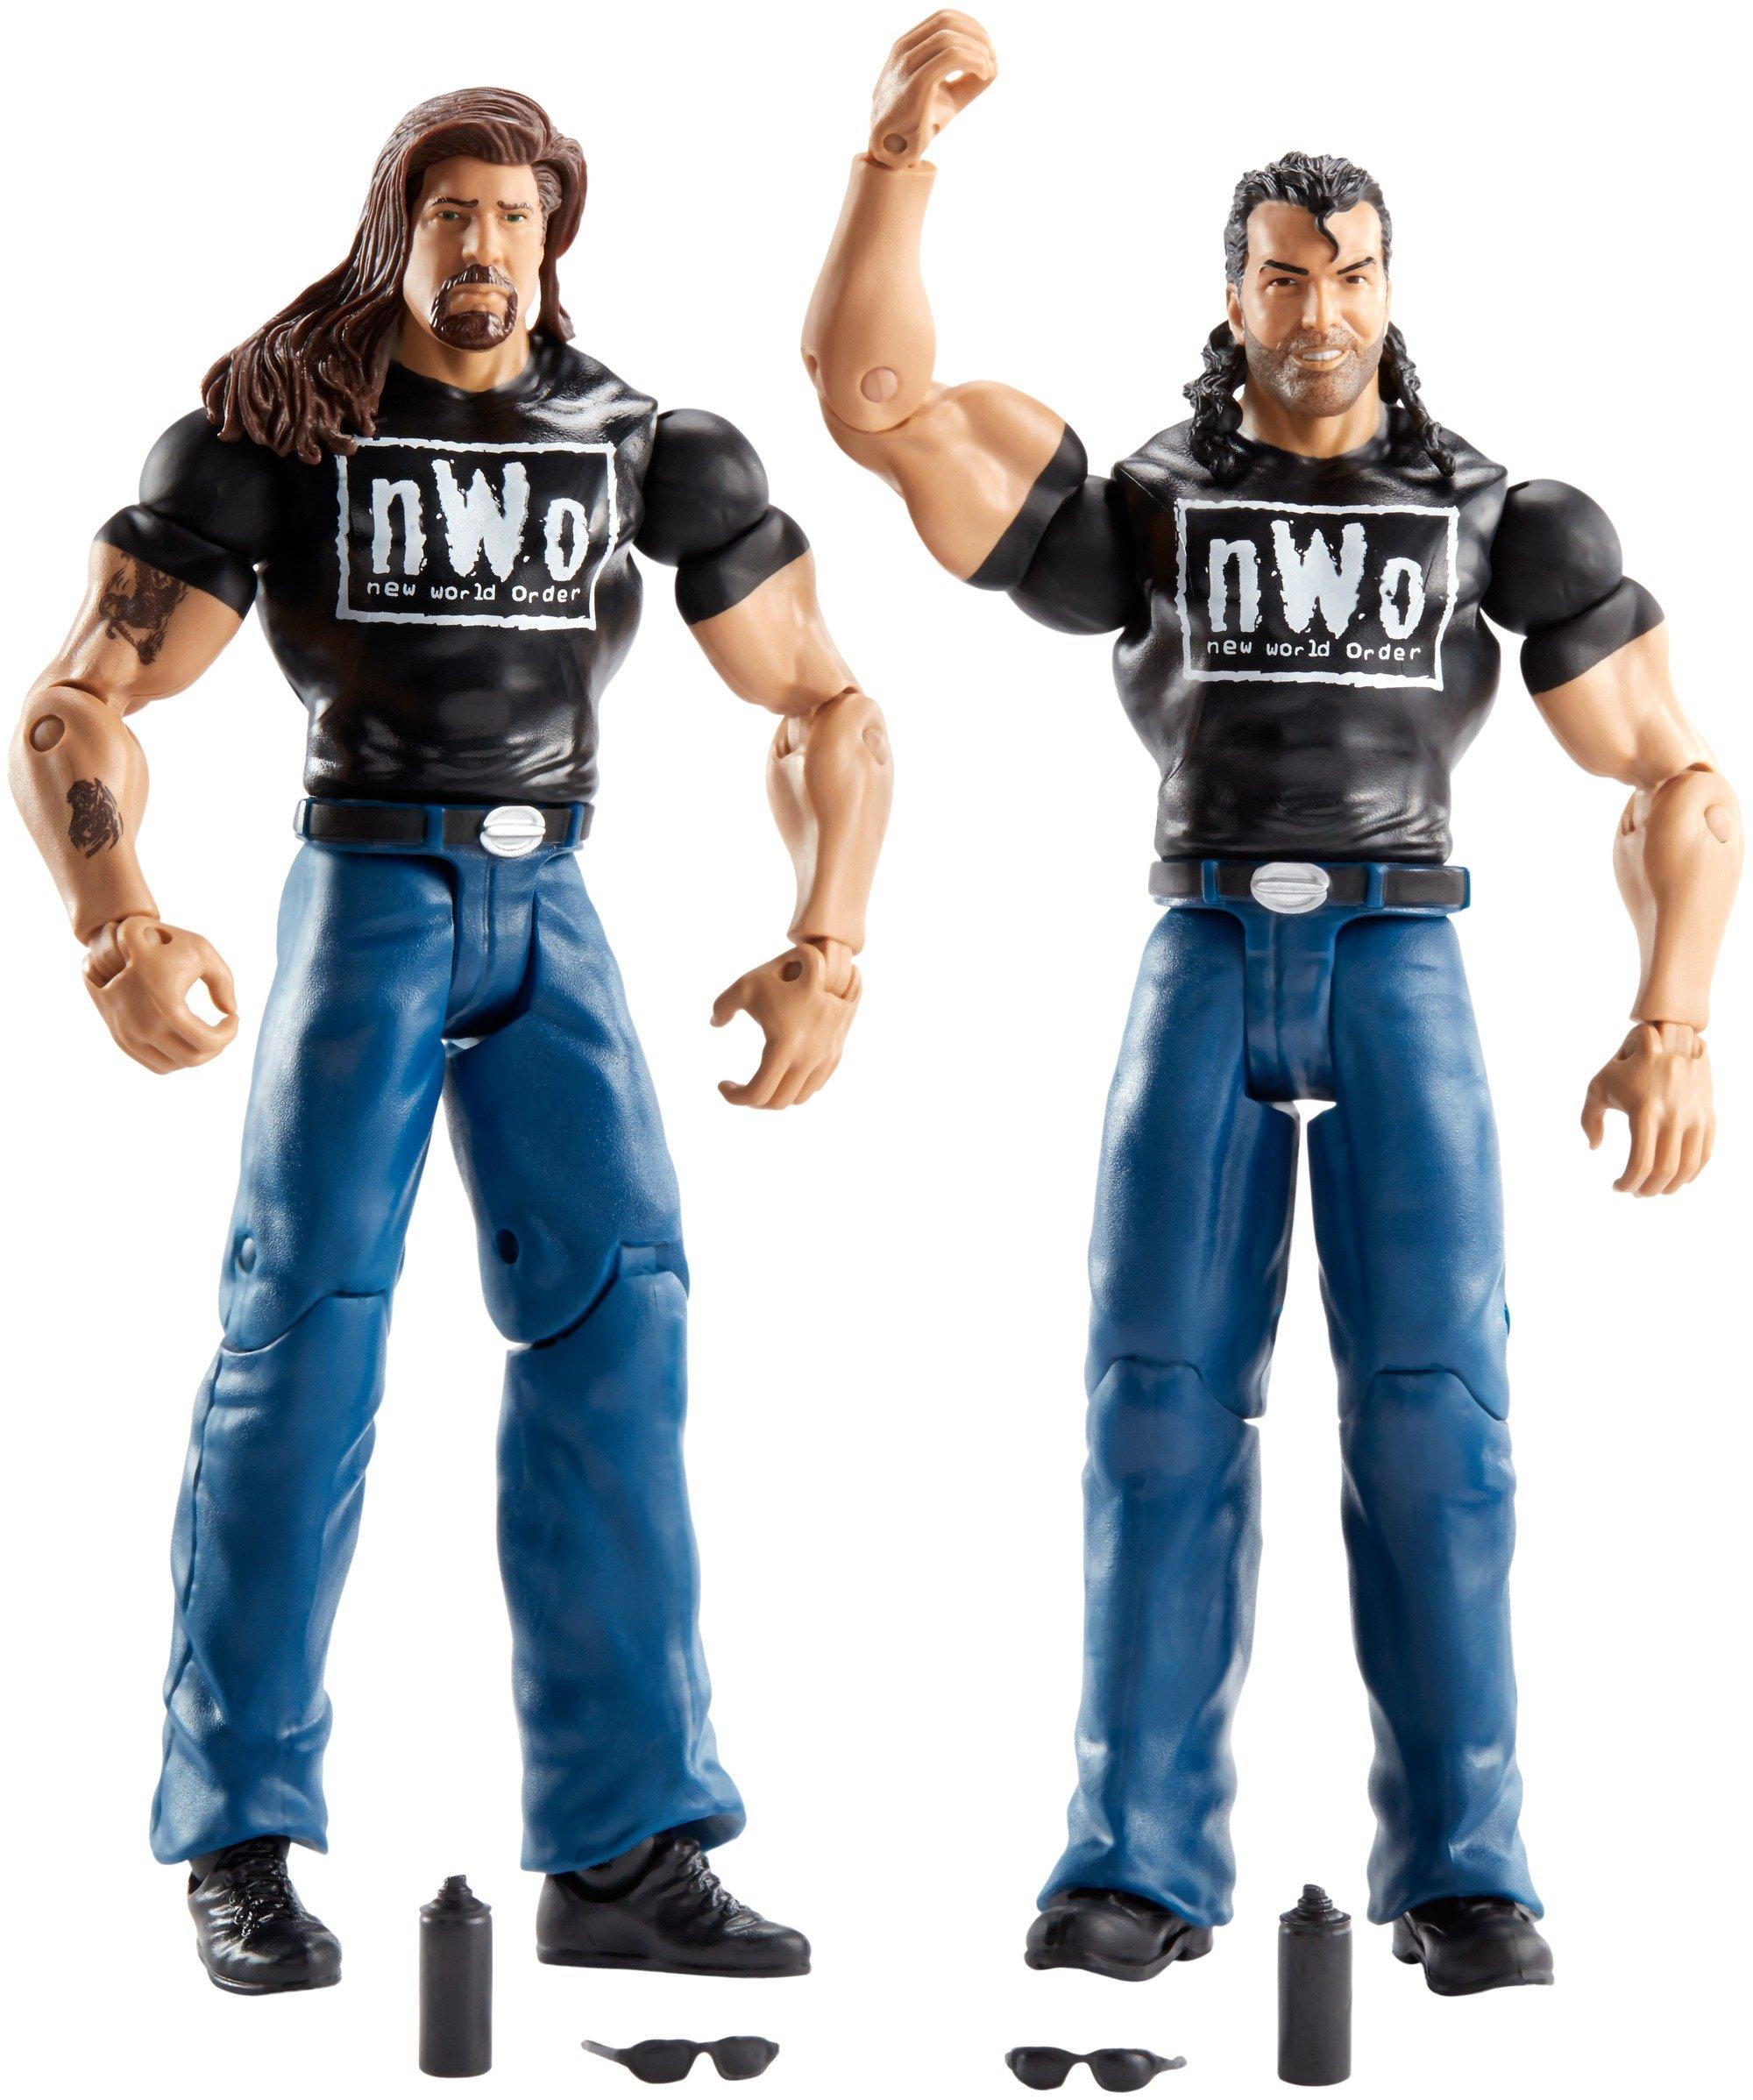 WWE Battle Pack The Outsiders Figura Acción, Pack 2: Amazon.es: Juguetes y juegos